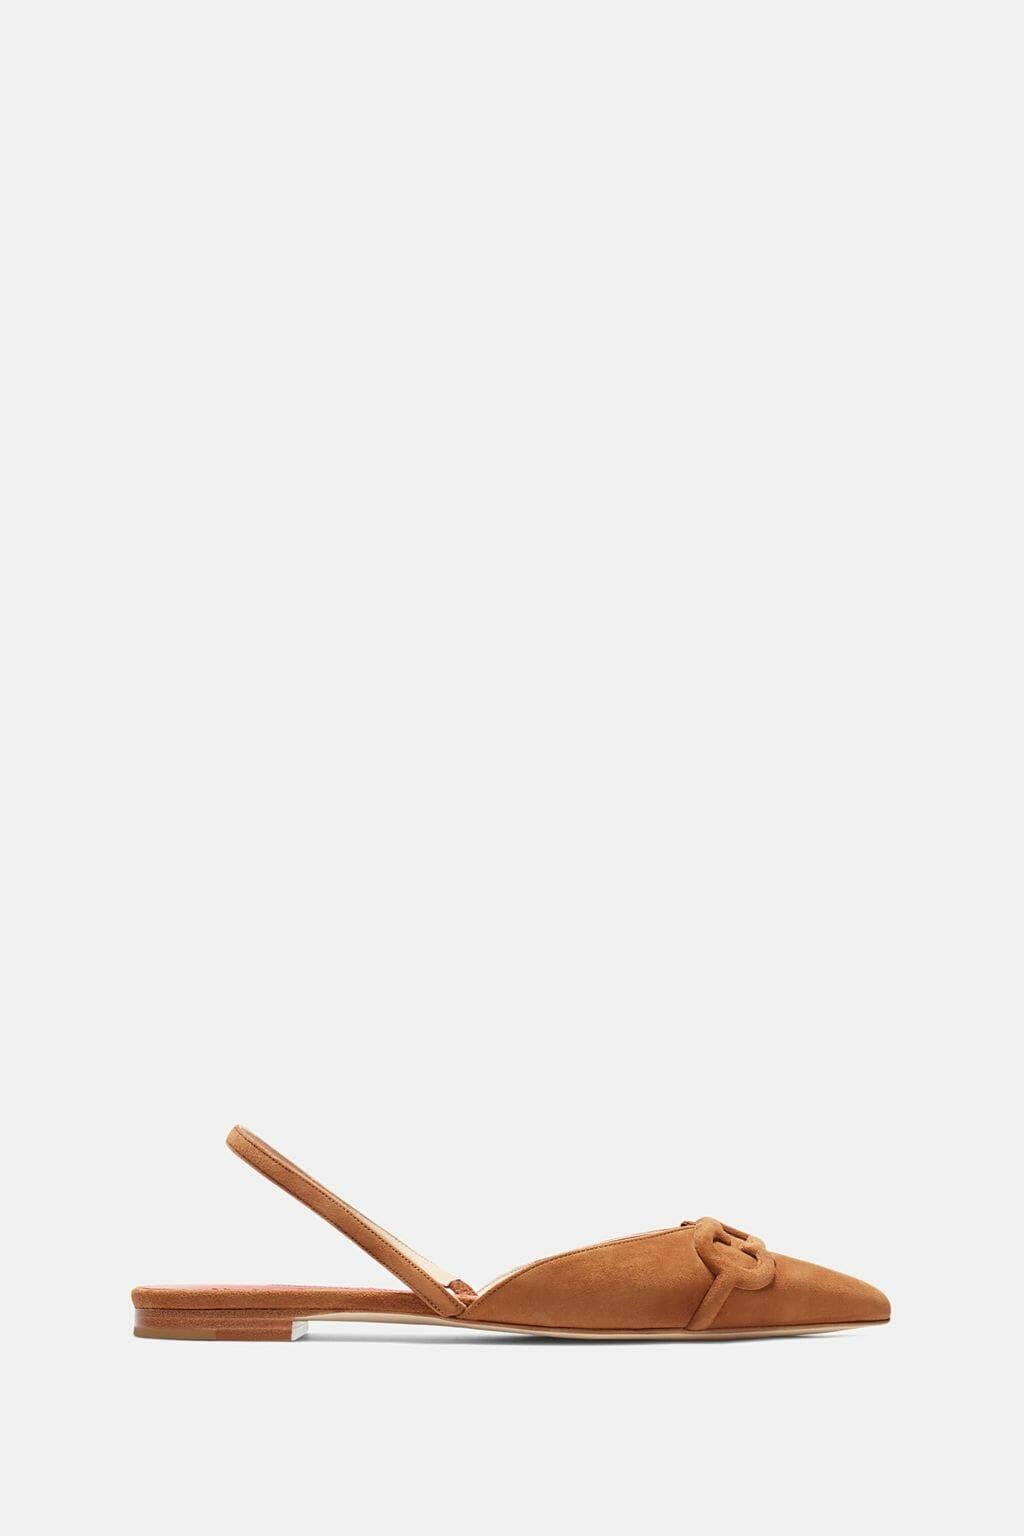 CH-Carolina-herrera-shoes-collection-Spring-Summer-2018-shoe-37